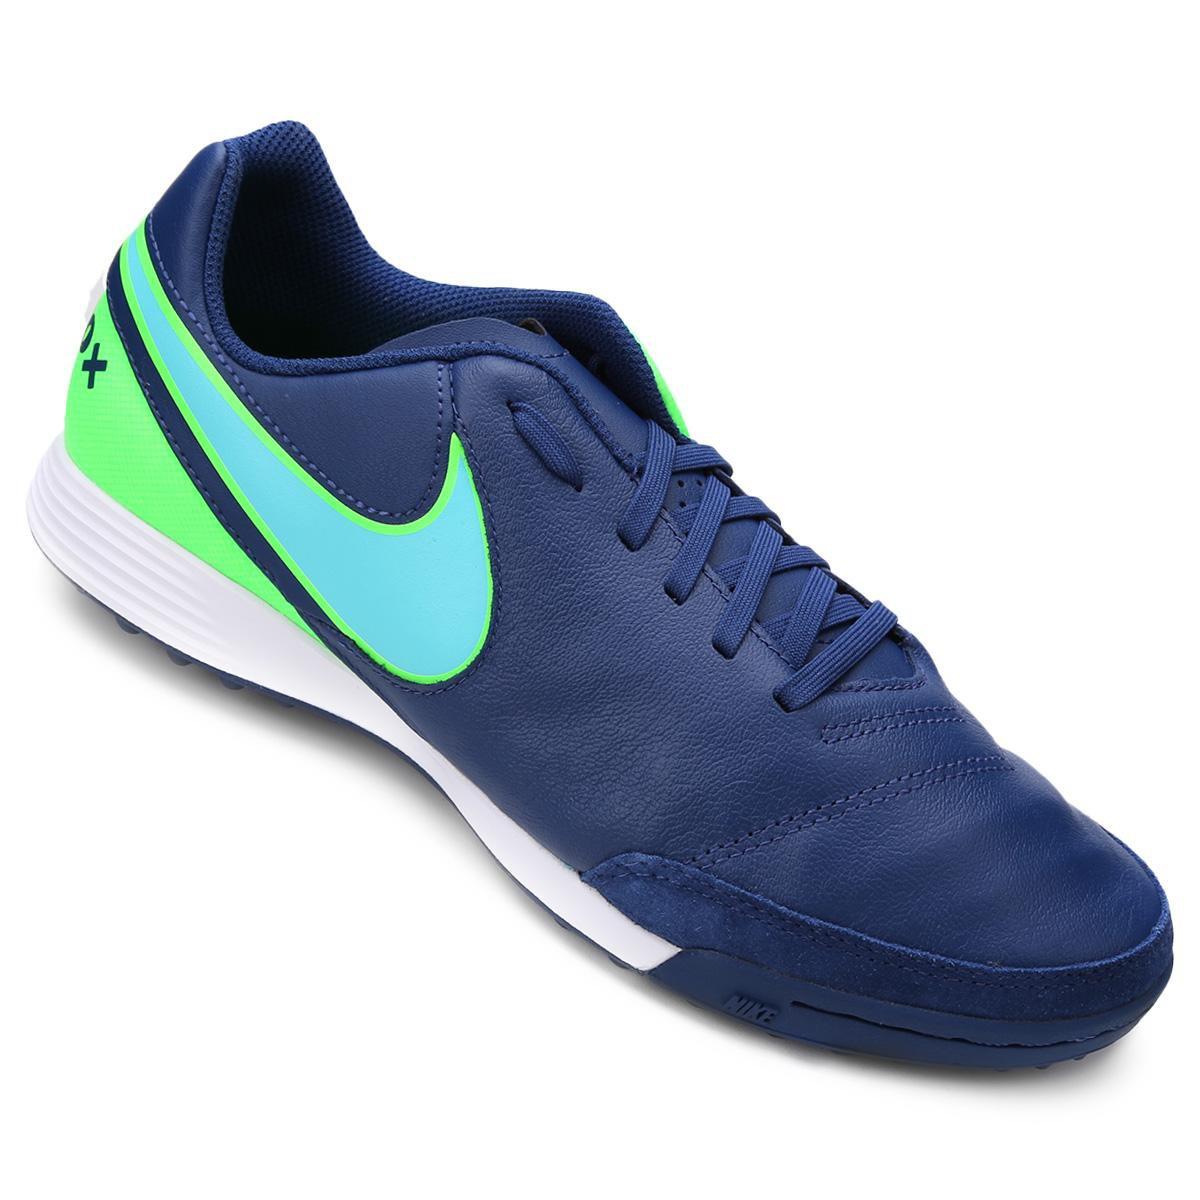 f995bc74d7 Chuteira Society Nike Tiempo Genio 2 Leather TF